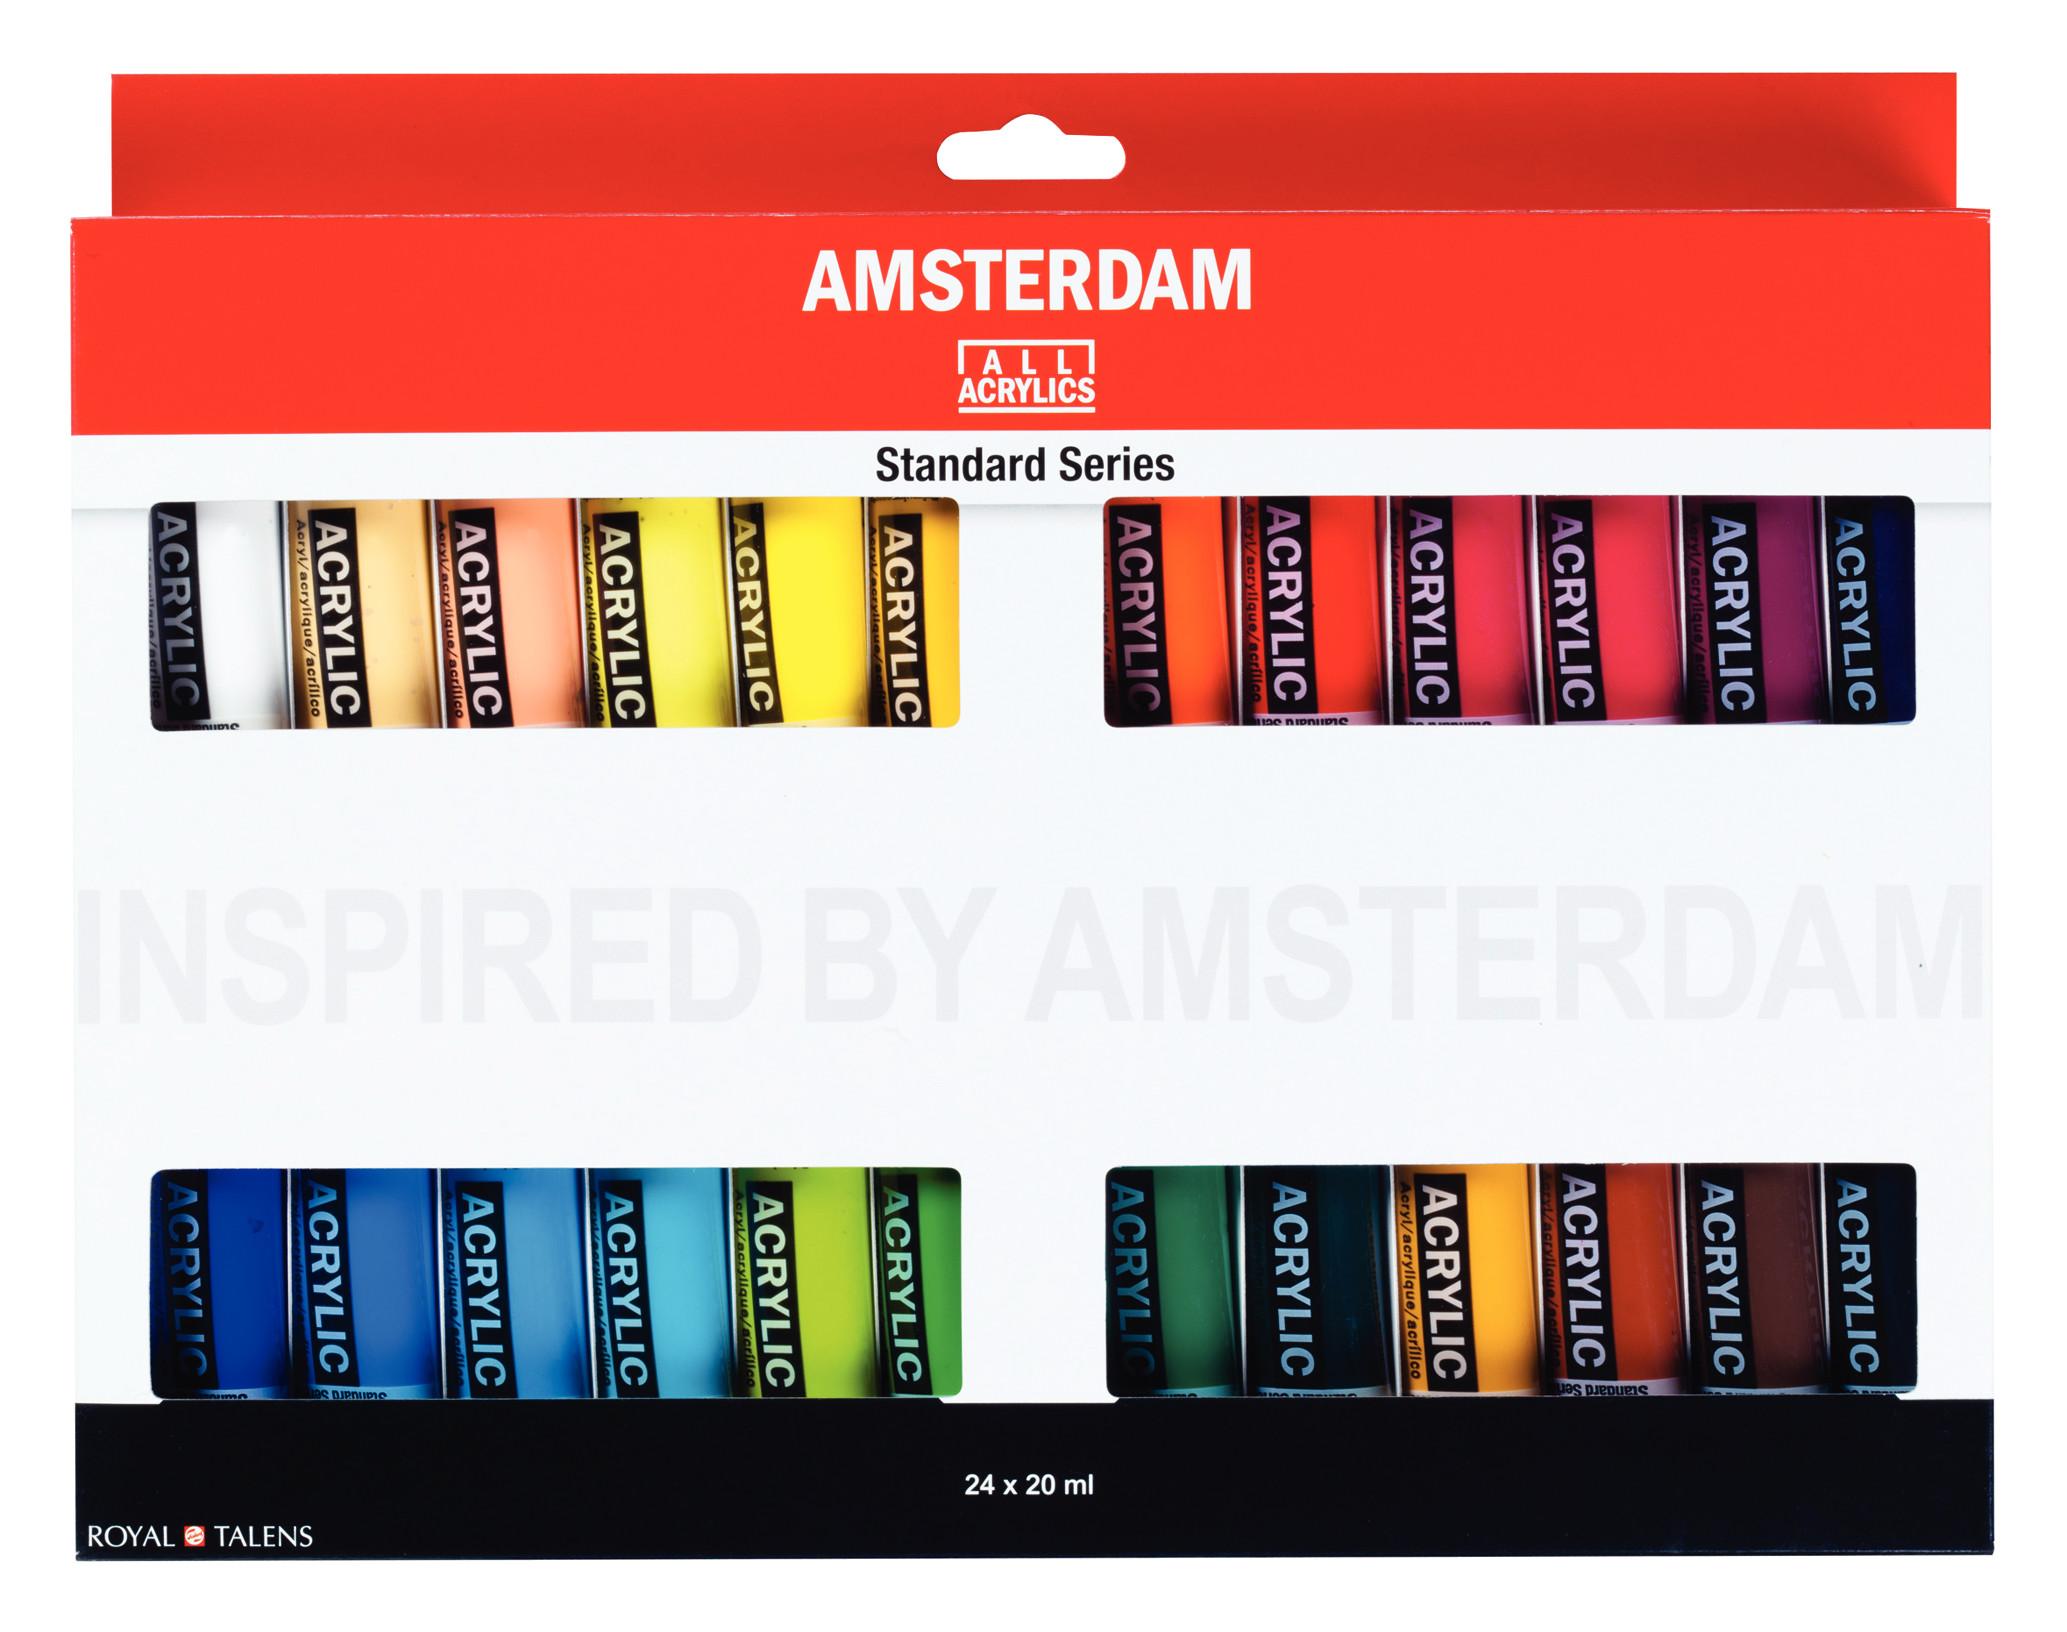 Amsterdam Standard Series Acrylics 24 x 20 ml Set